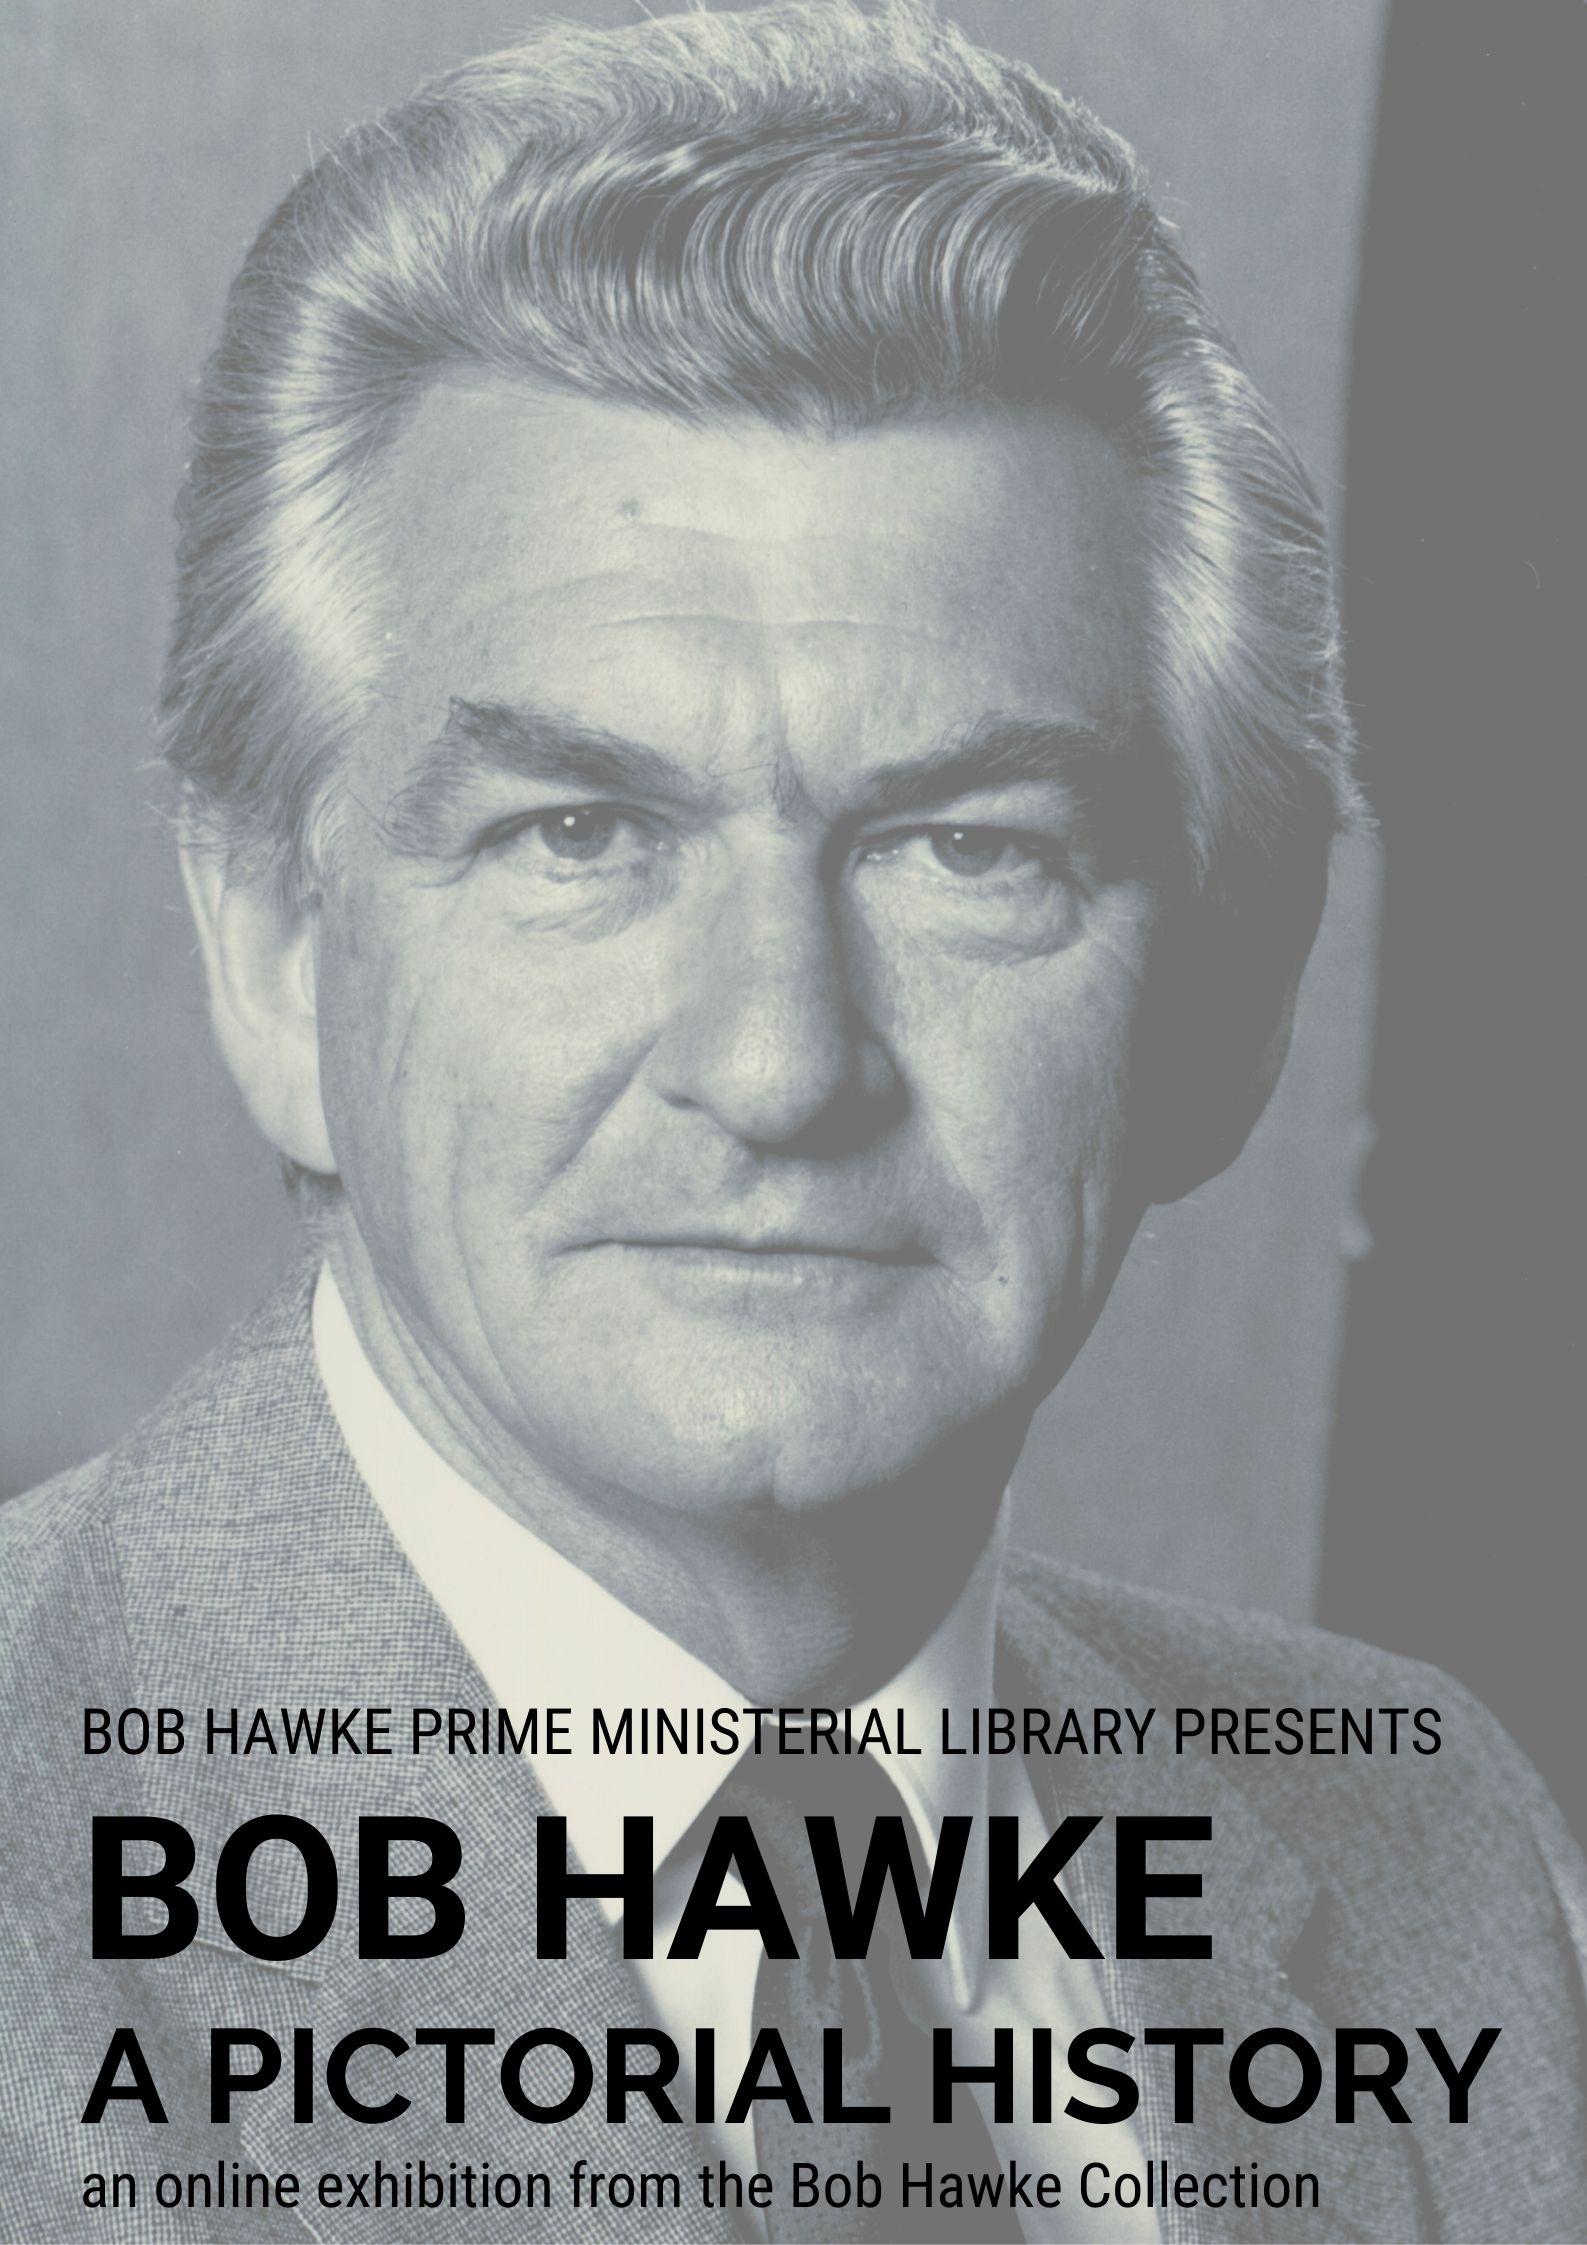 Bob Hawke a pictorial history